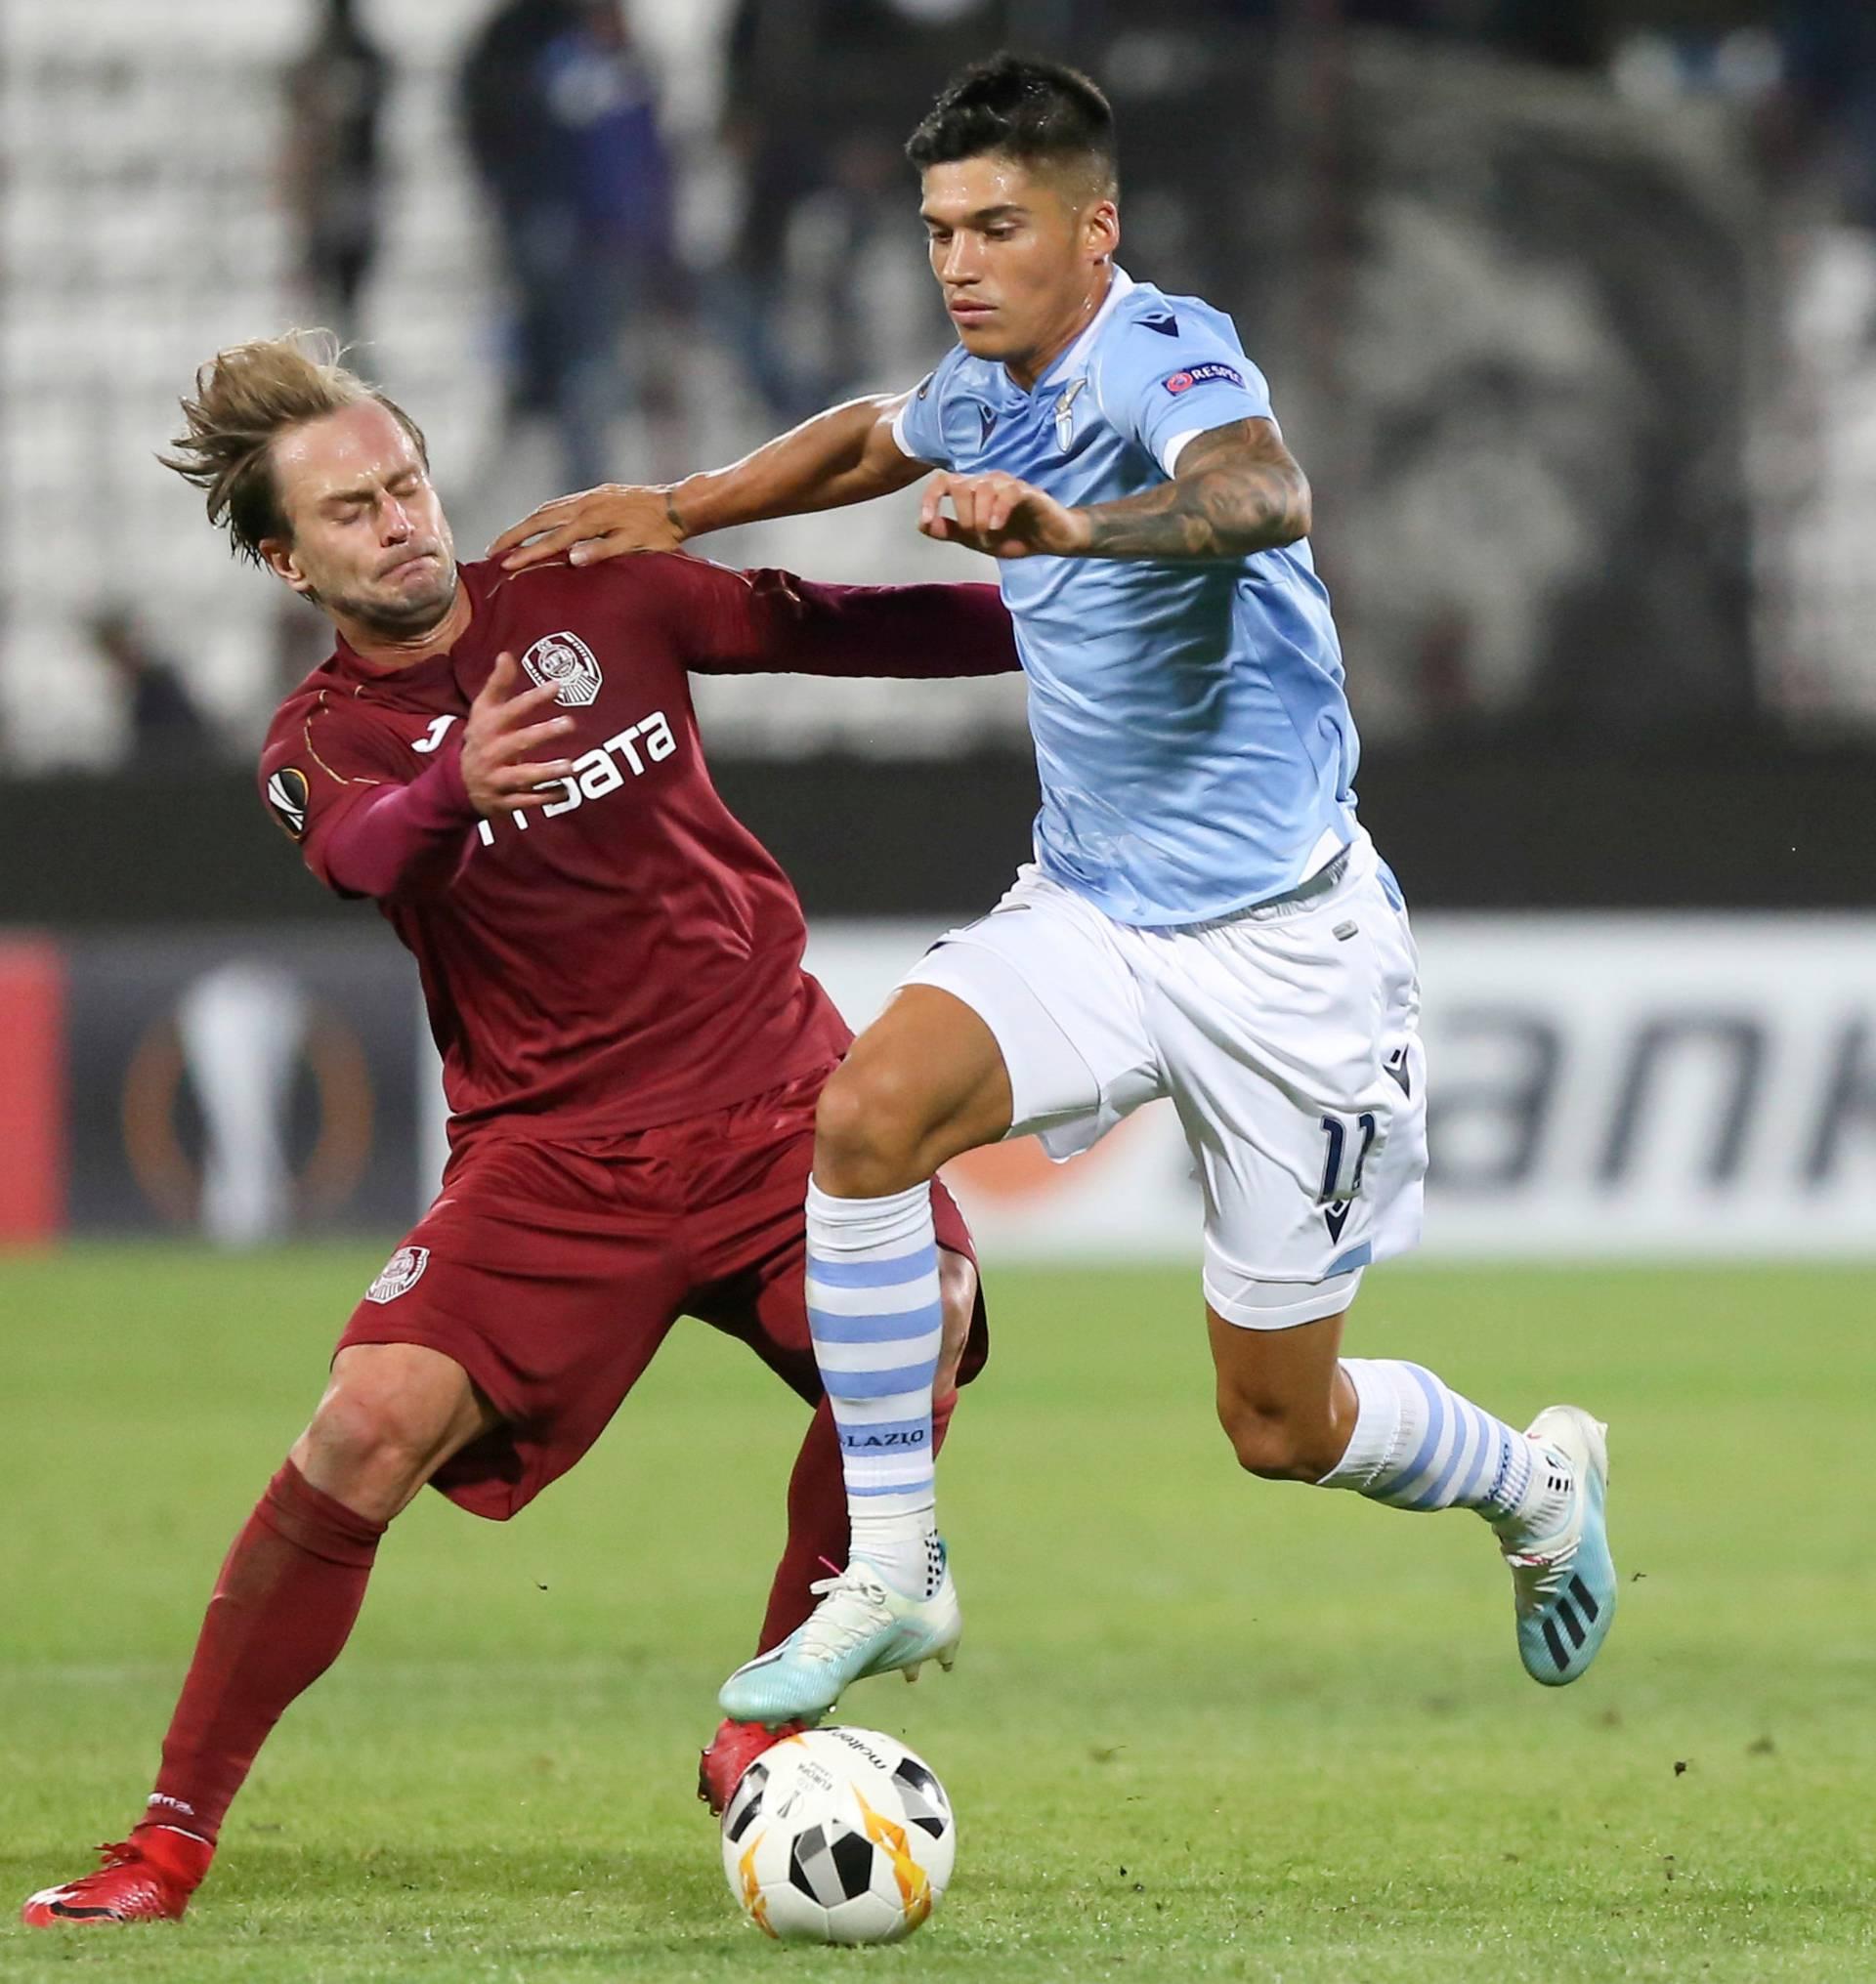 Europa League - Group E - CFR Cluj v Lazio